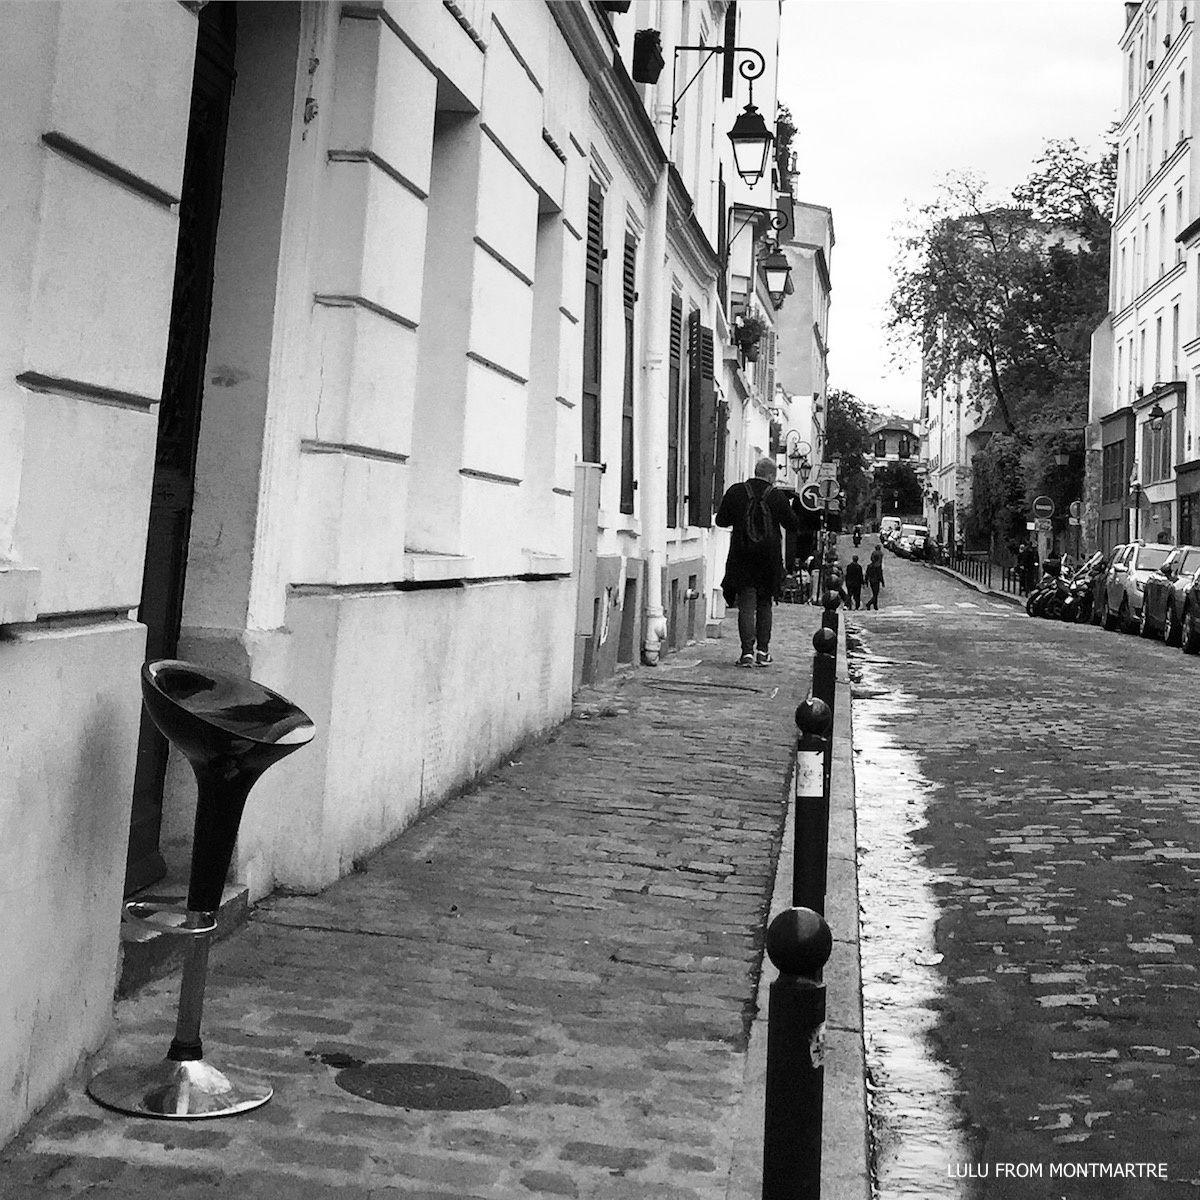 06. Lost in Montmartre, 75018